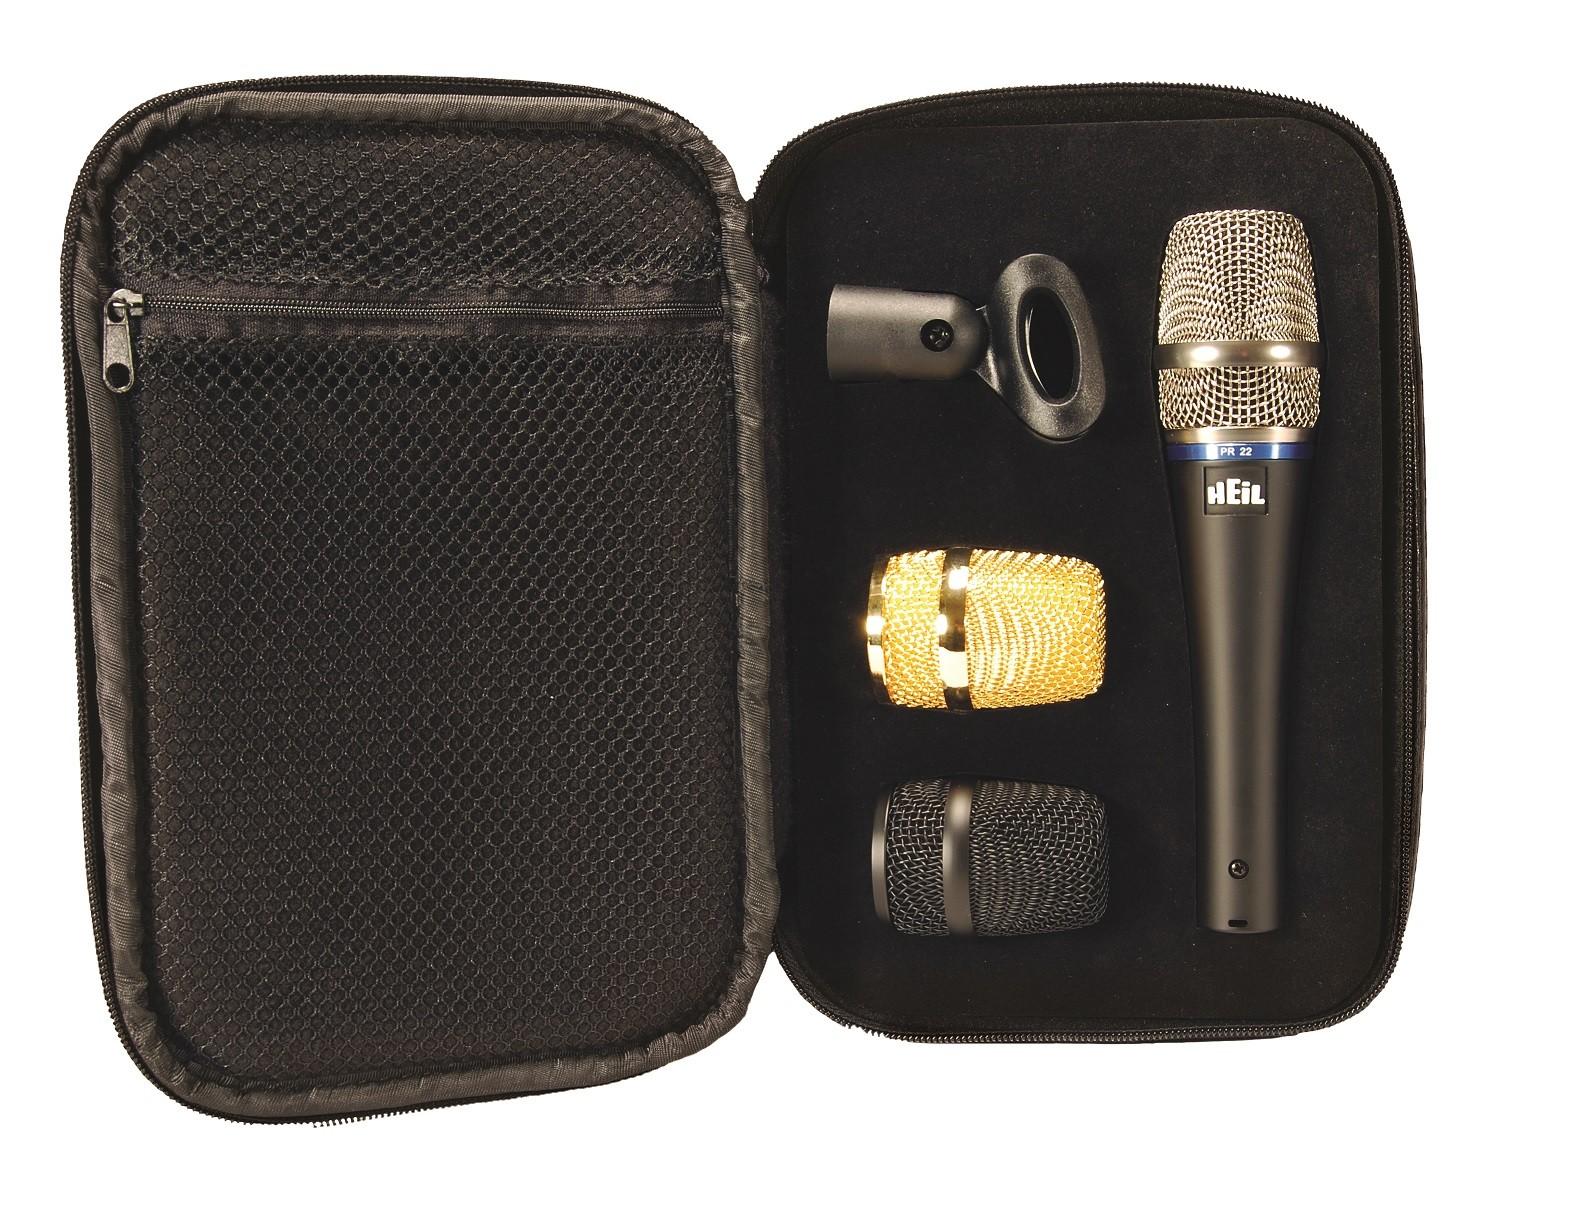 PR-22 Low Noise Microphone